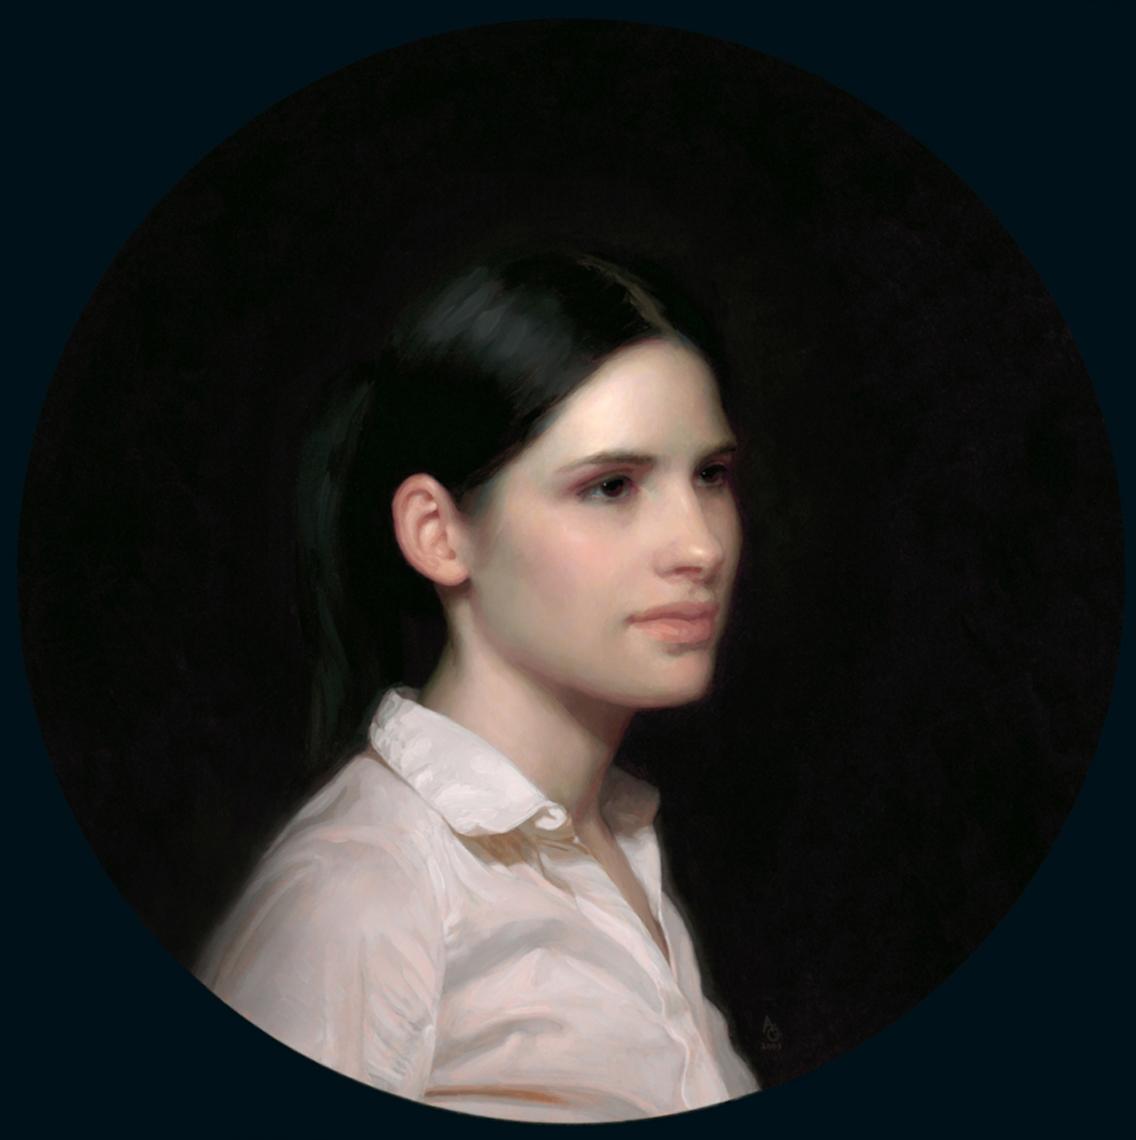 adrian gottlieb - portrait of sarah hilker